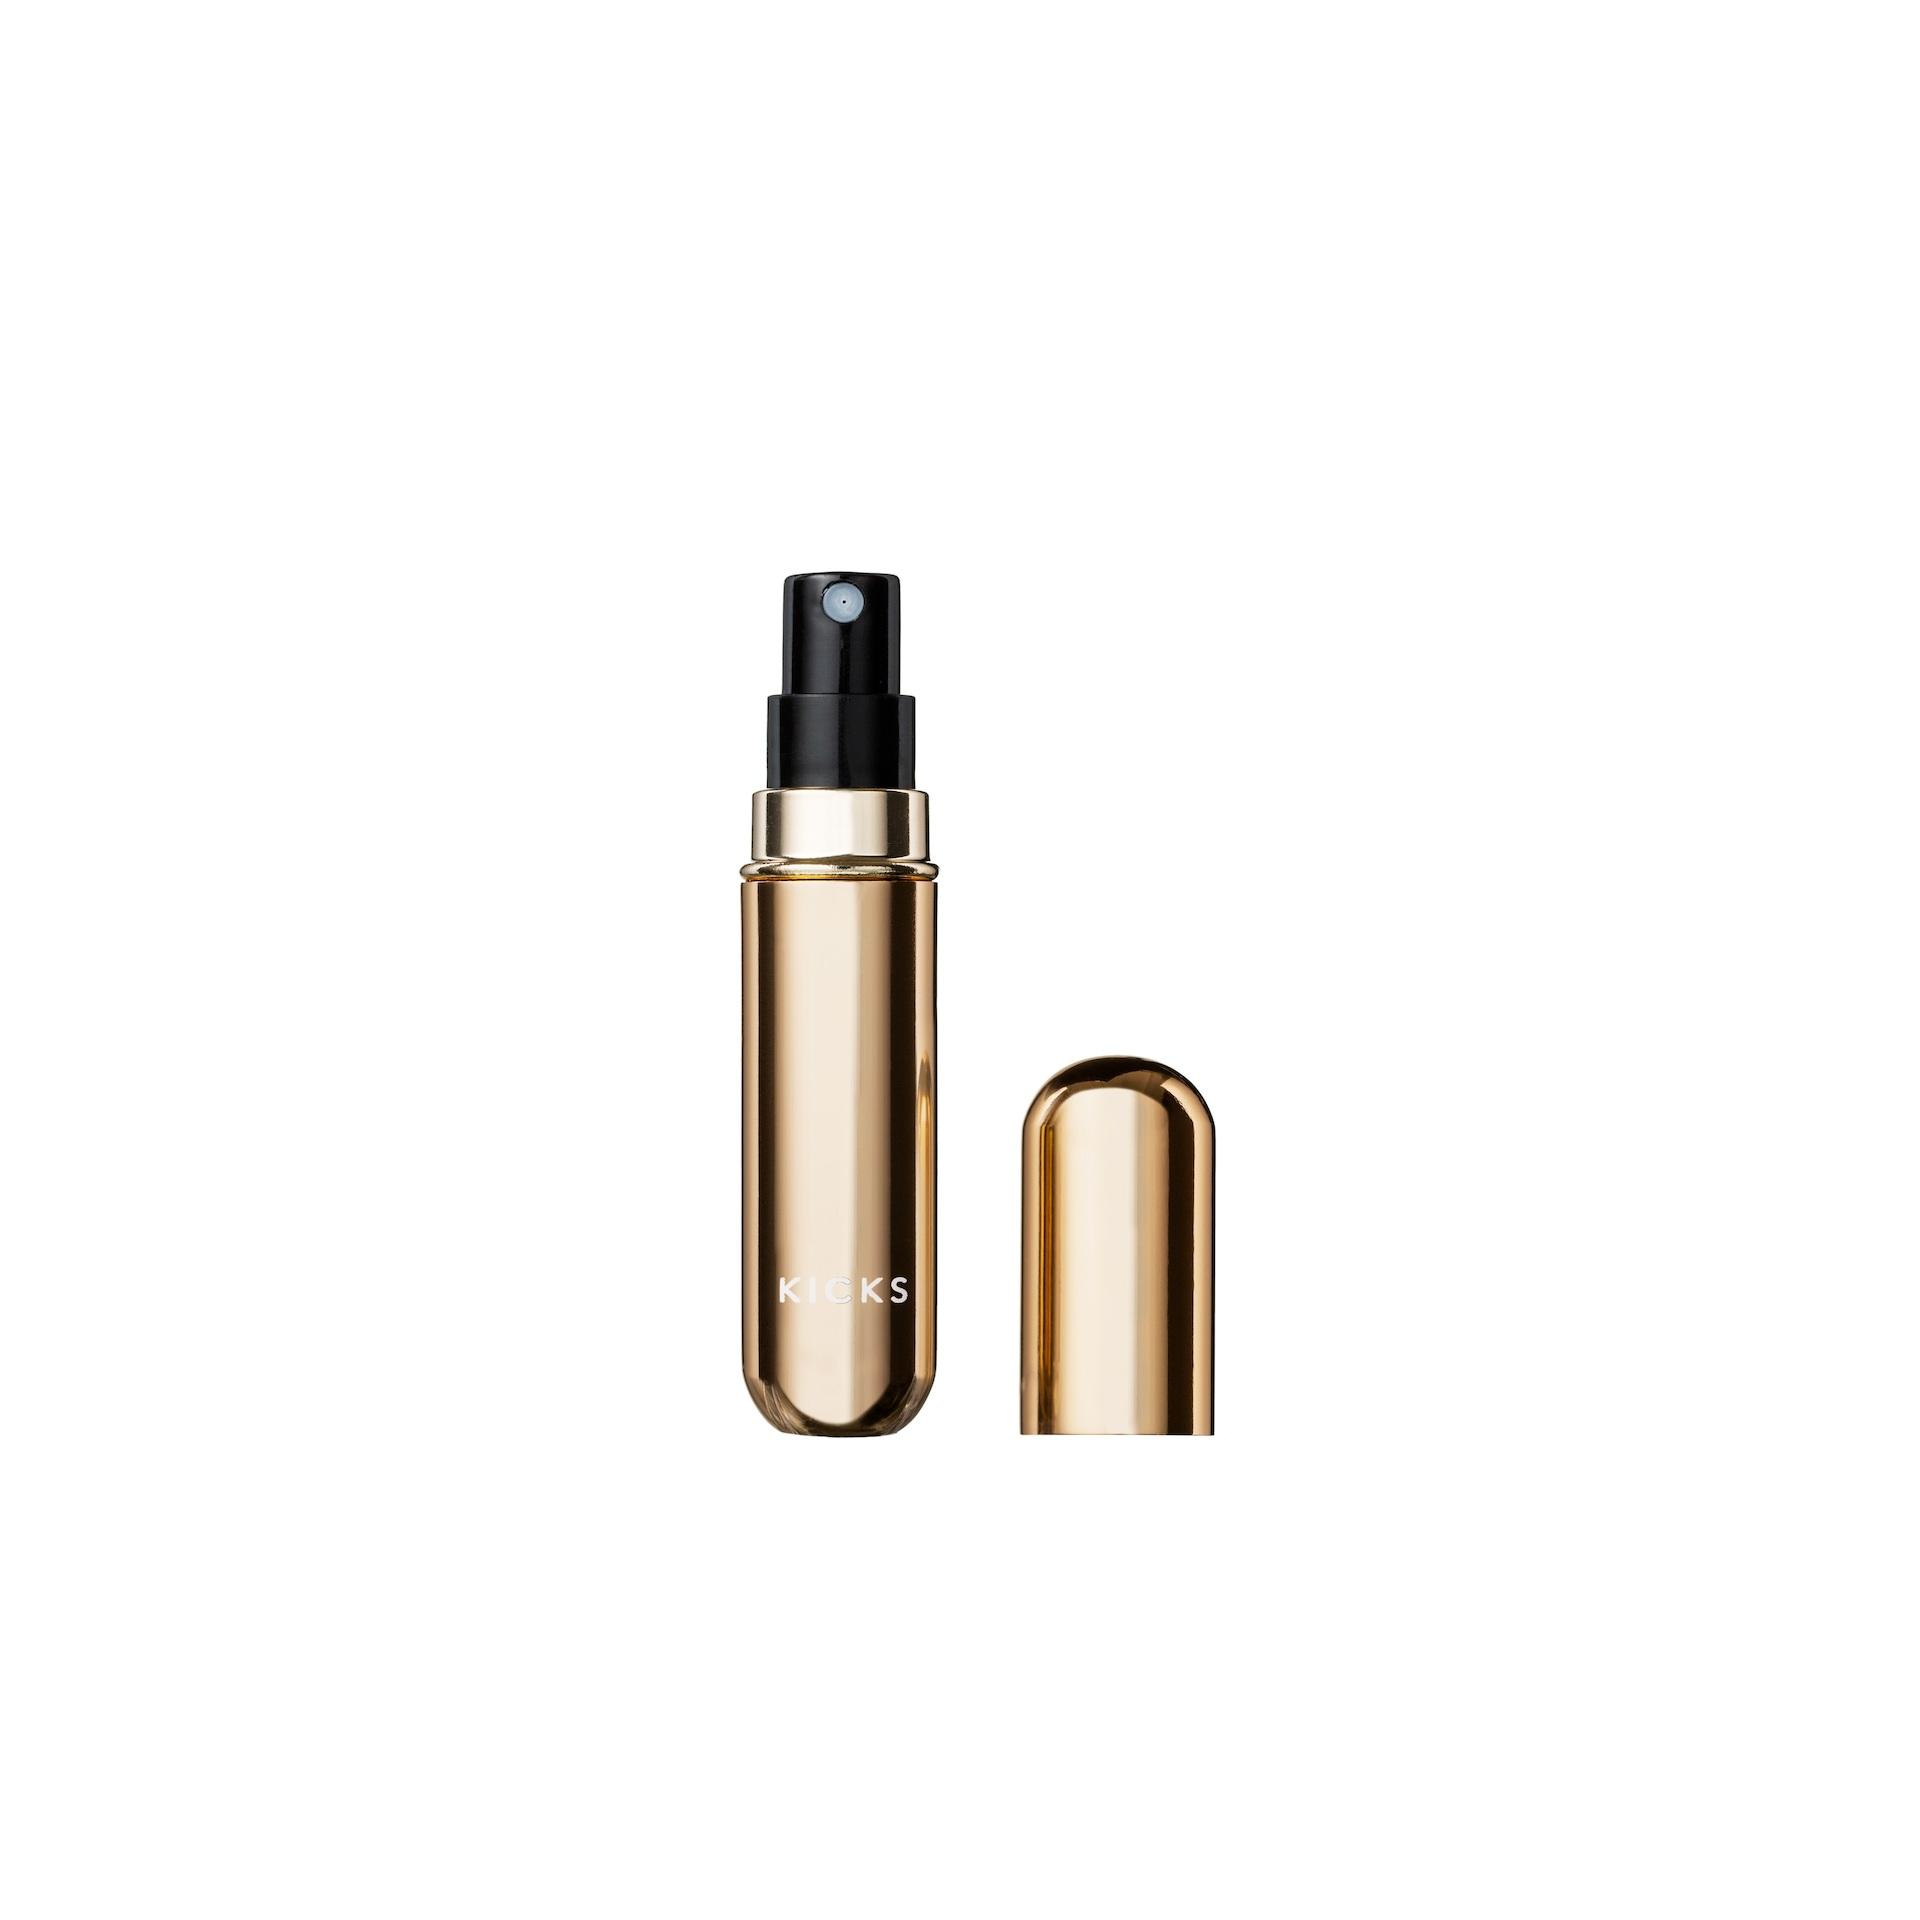 Perfume Atomizer Gold